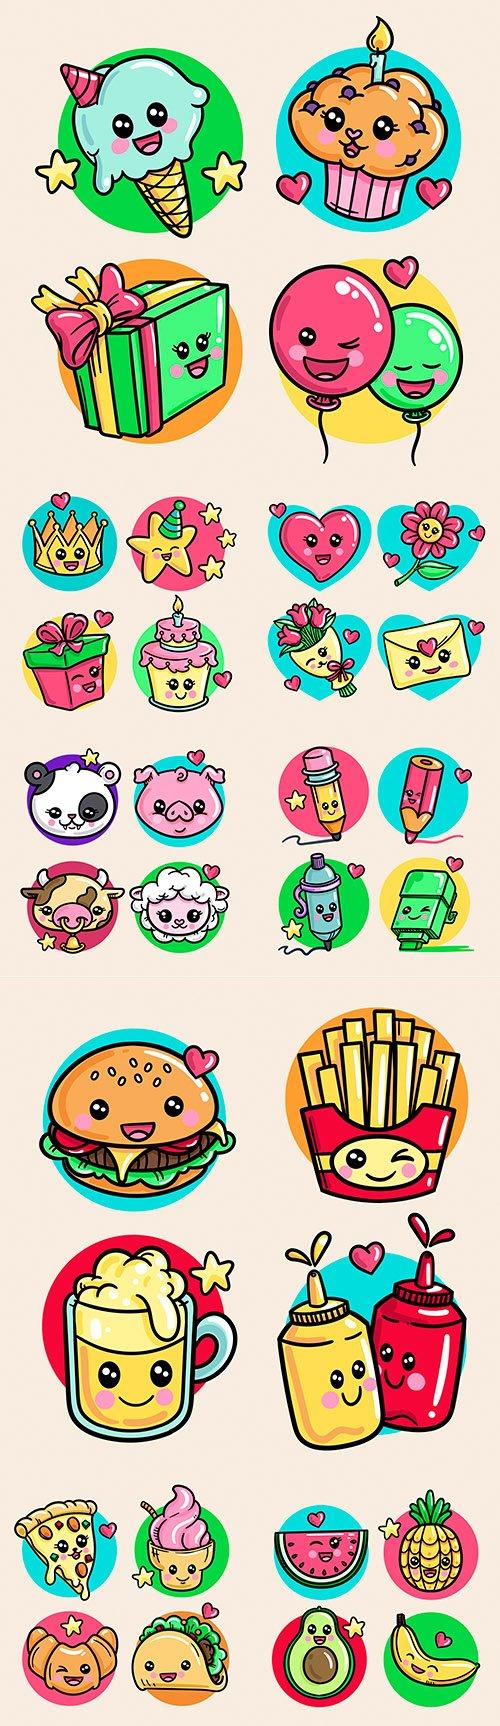 Tasty cakes and animal collection of kawaii creativity